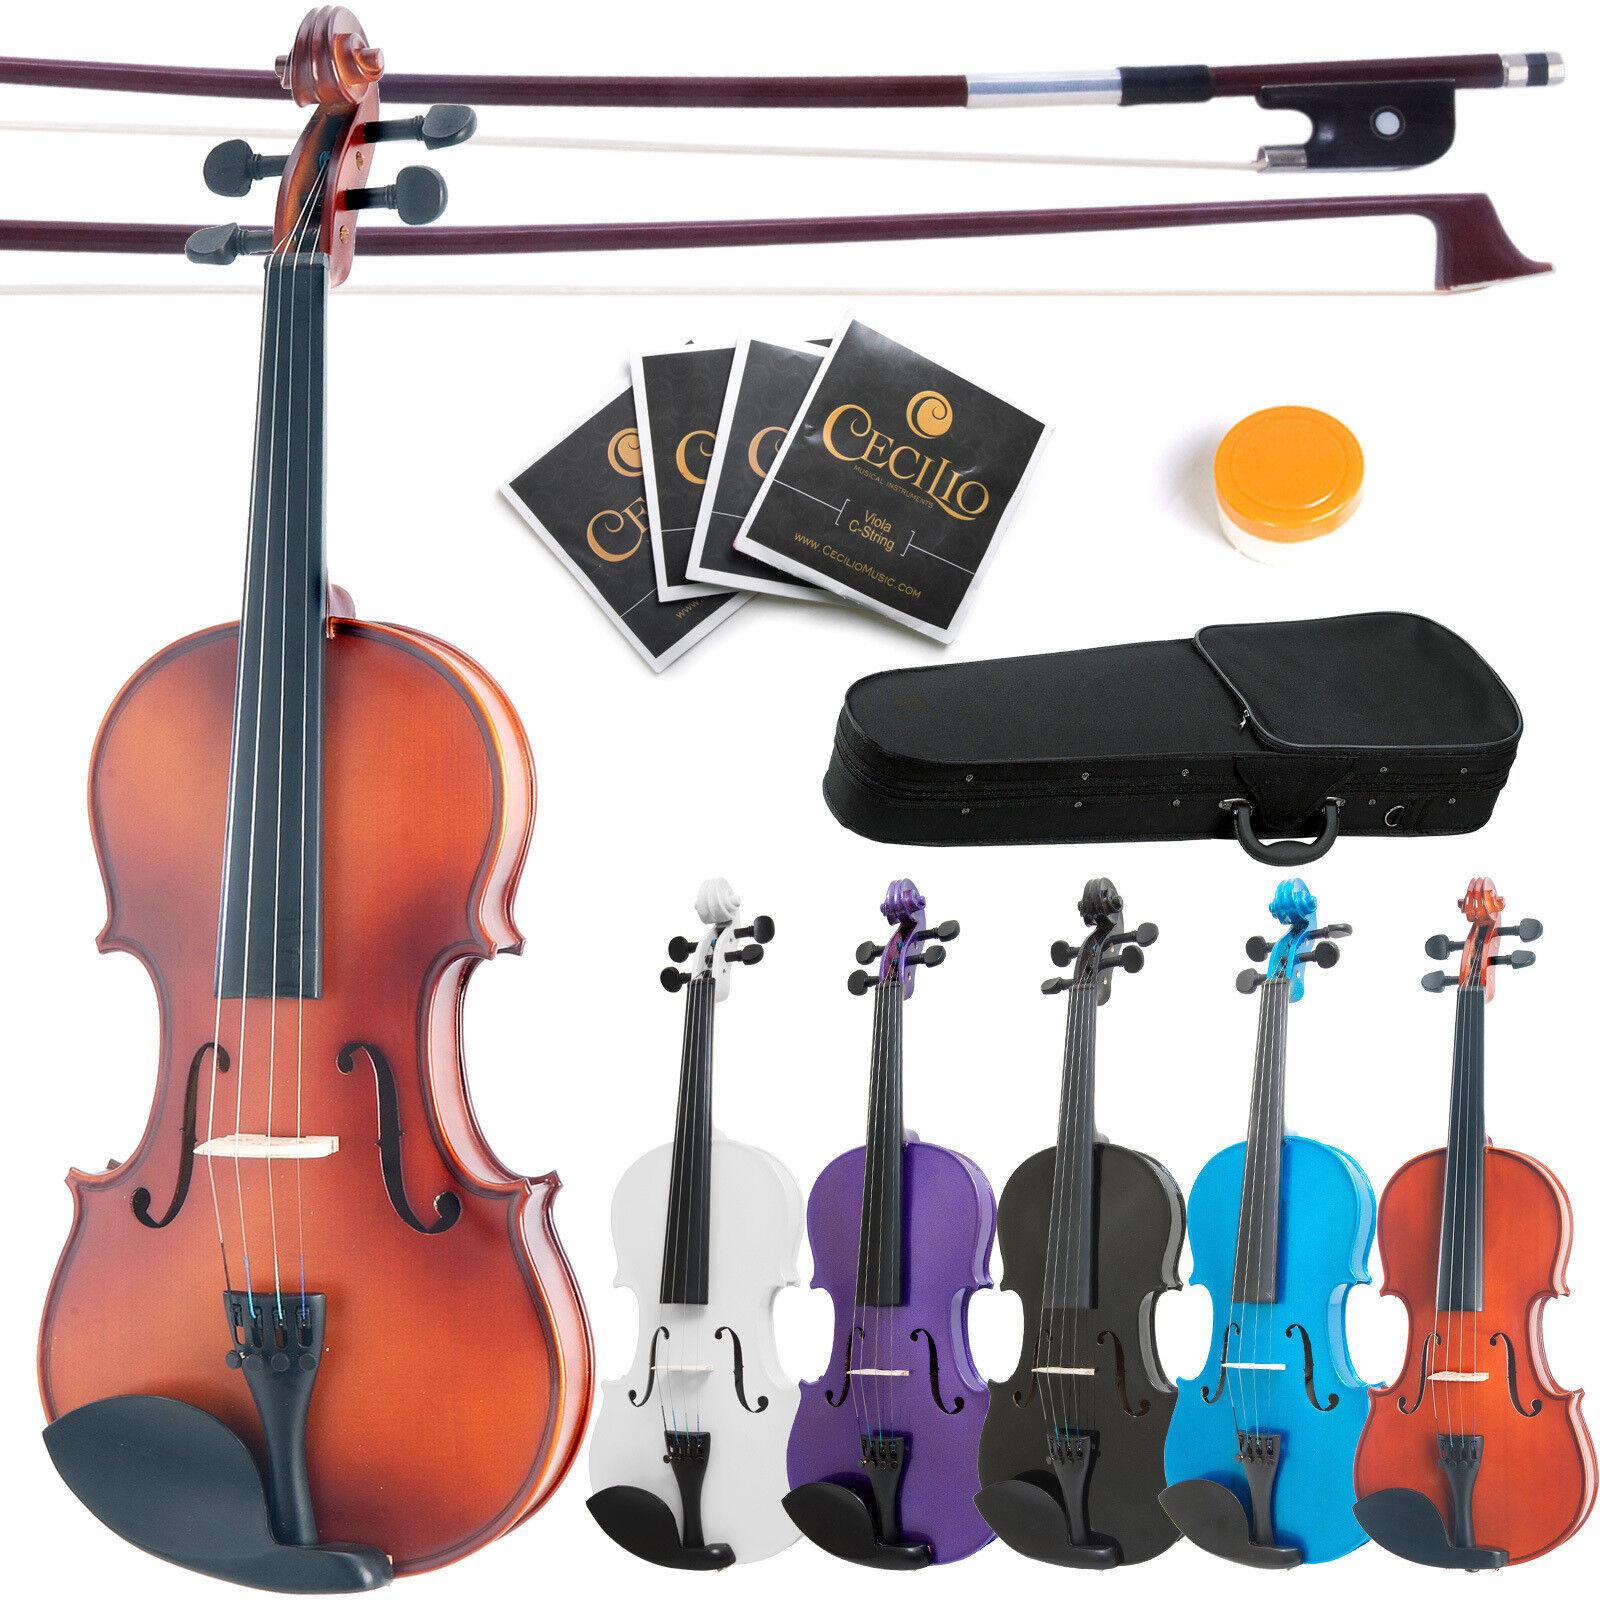 mendini-acoustic-viola-size-16-15-14-13-12-wood-black-blue-purple-white